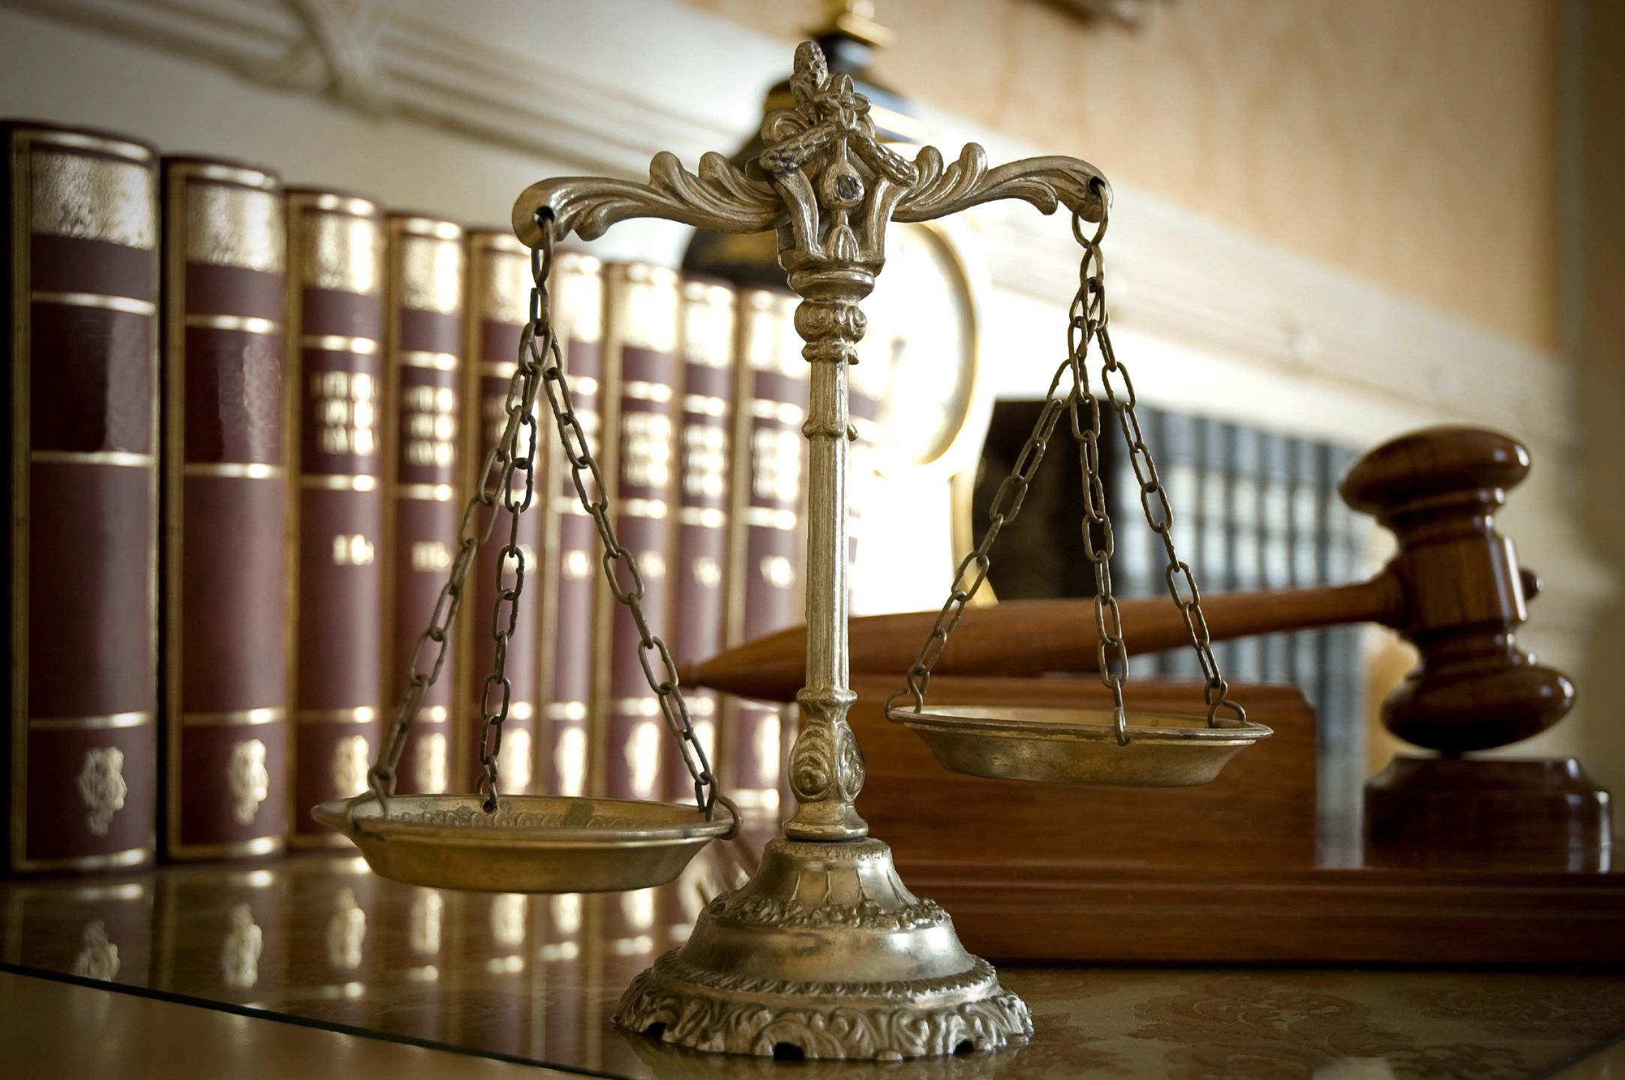 John L. McClain and Associates, Attorneys at Law